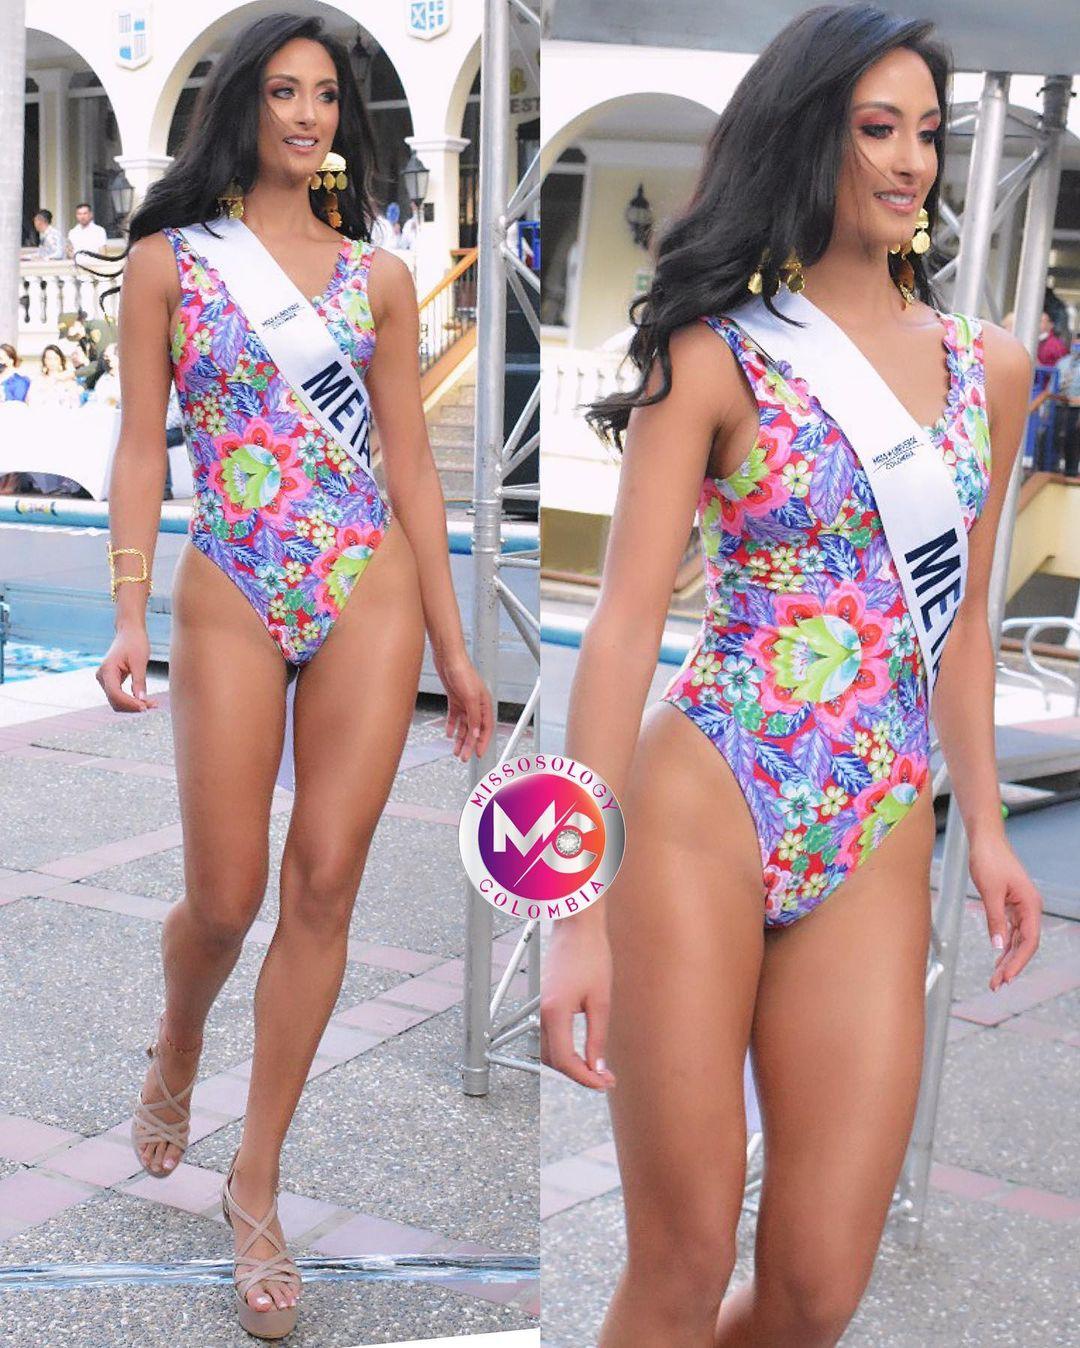 juliana franco, top 16 de miss colombia universo 2020/miss earth water 2017. - Página 24 Missos23